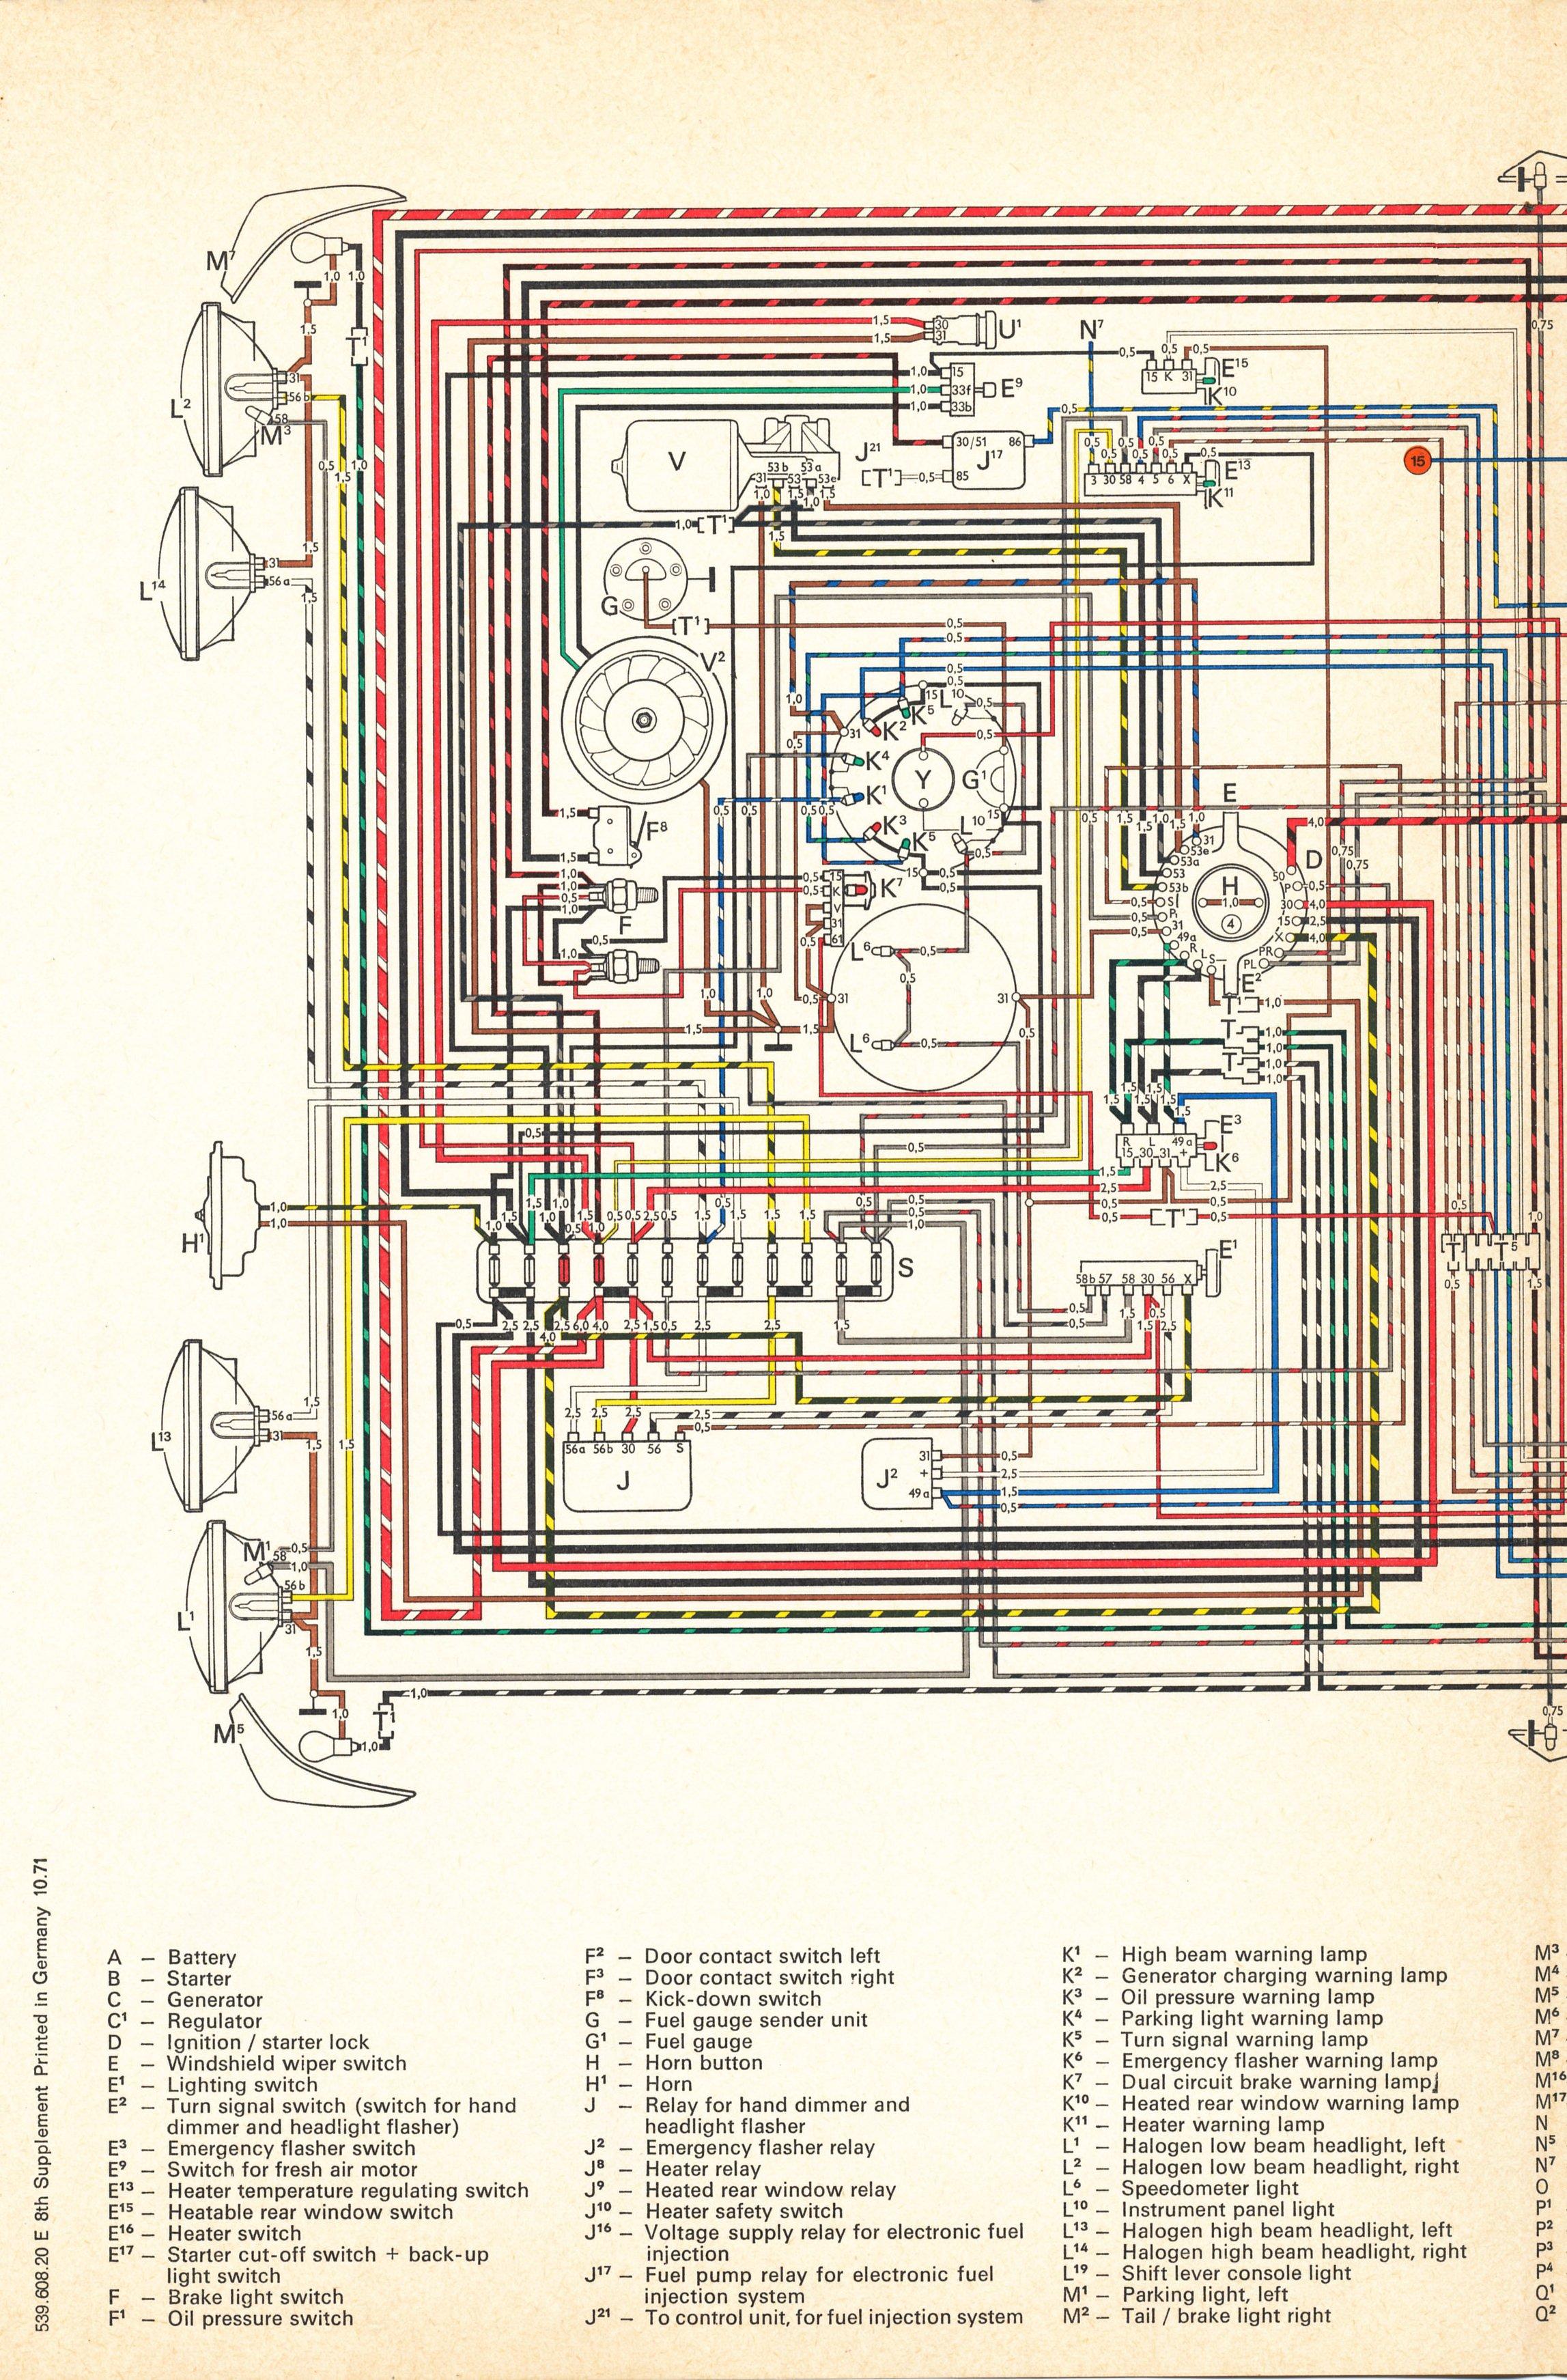 2000 Volvo S80 Fuse Location Free Download Wiring Diagram Schematic Switch Rh 86 Budoshop4you De